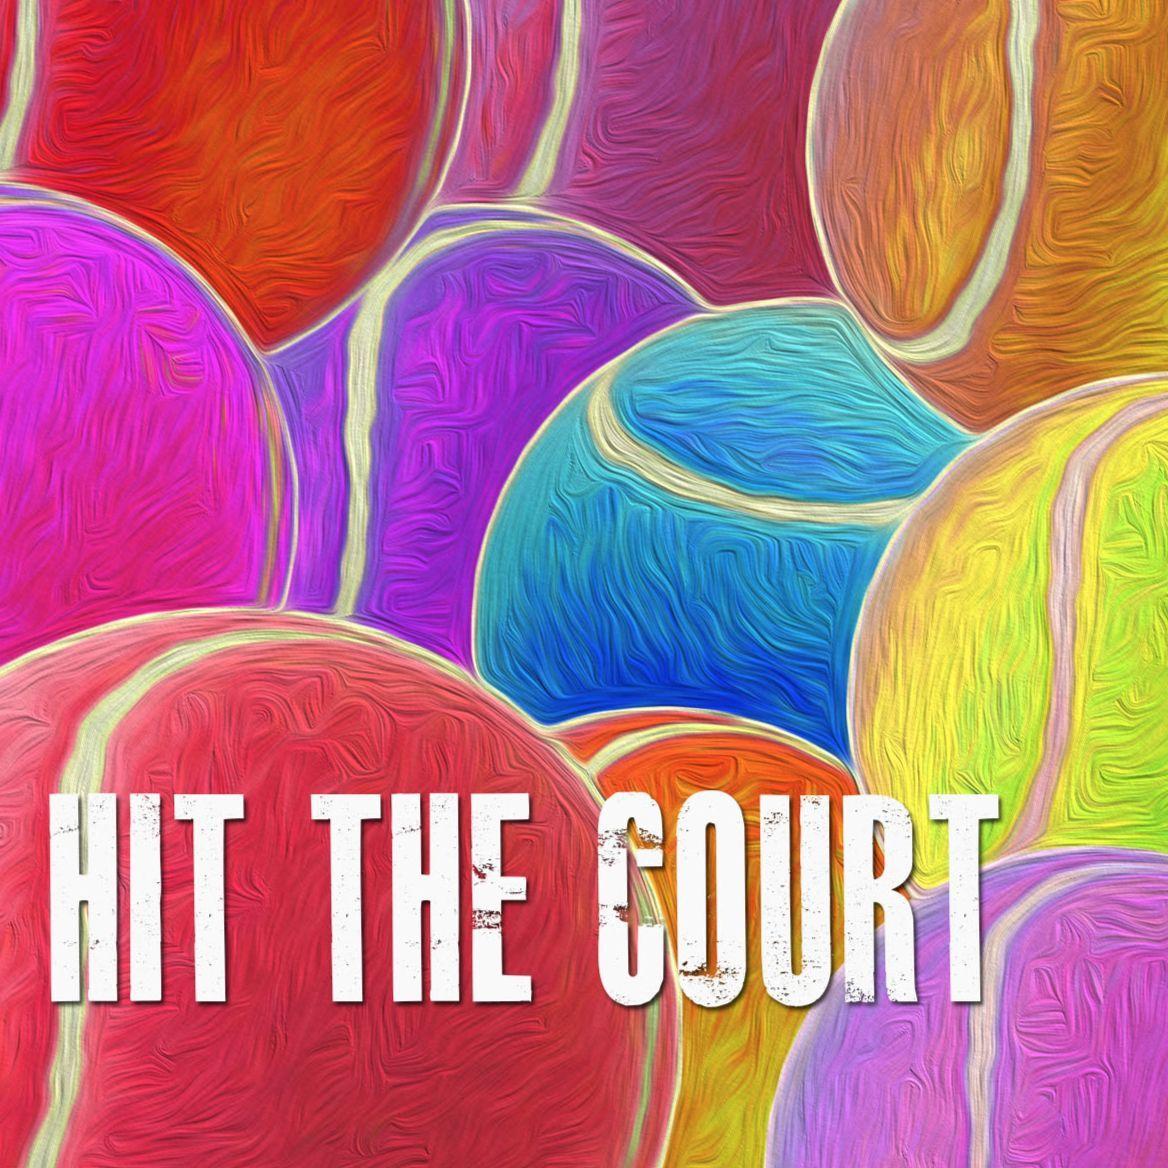 UTR's Influence on the Tennis World